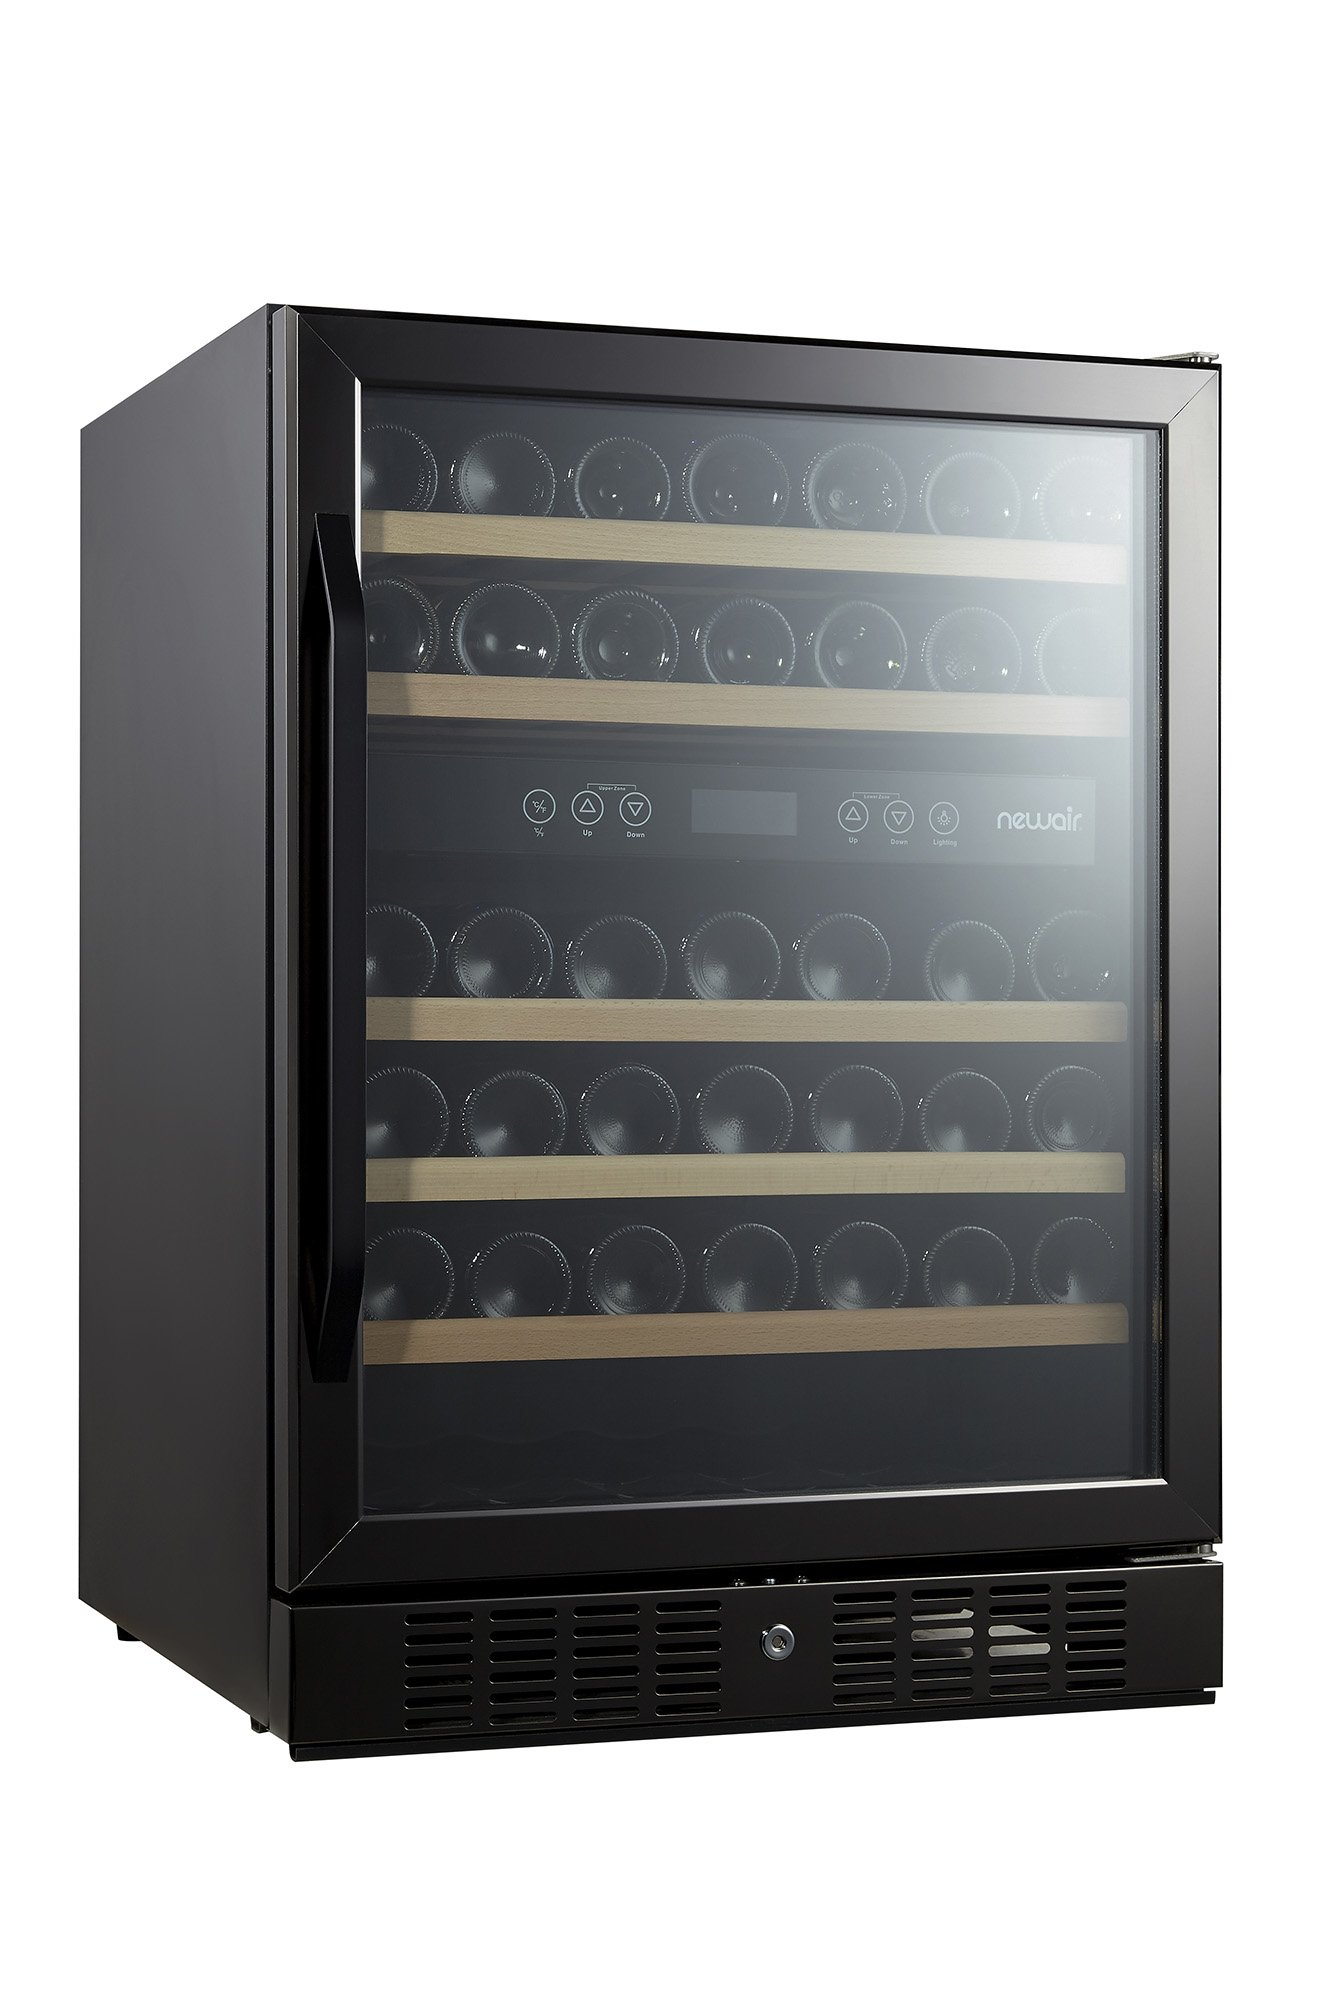 NewAir AWR-460DB-B Dual Zone 46 Bottle Built in Wine Cooler, Black Stainless Steel